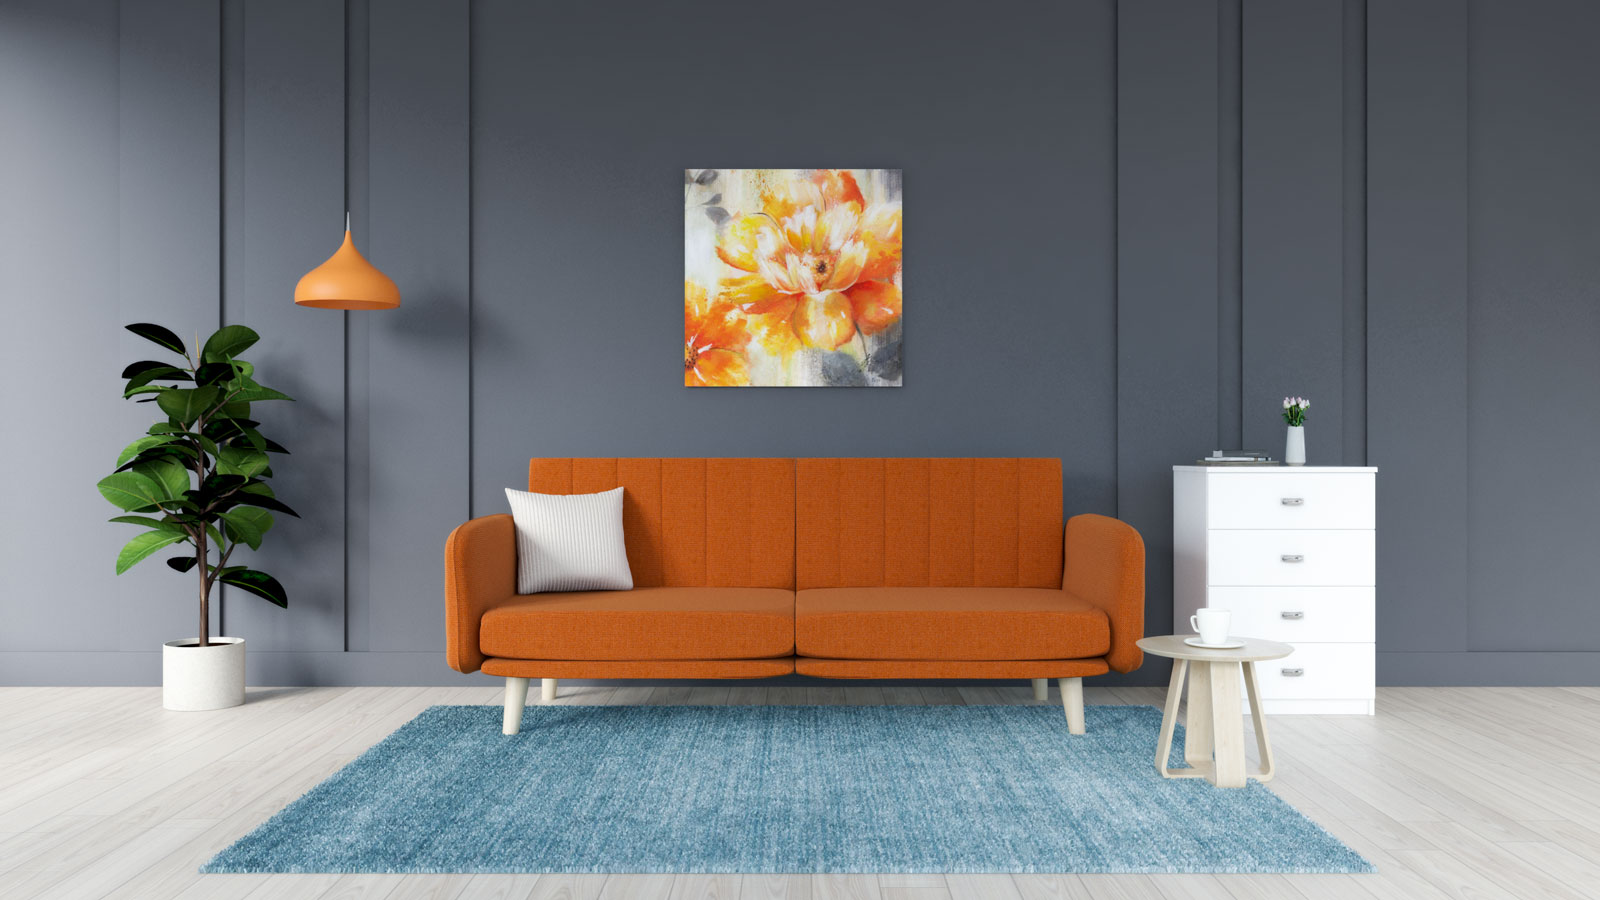 Aqua rug with orange sofa